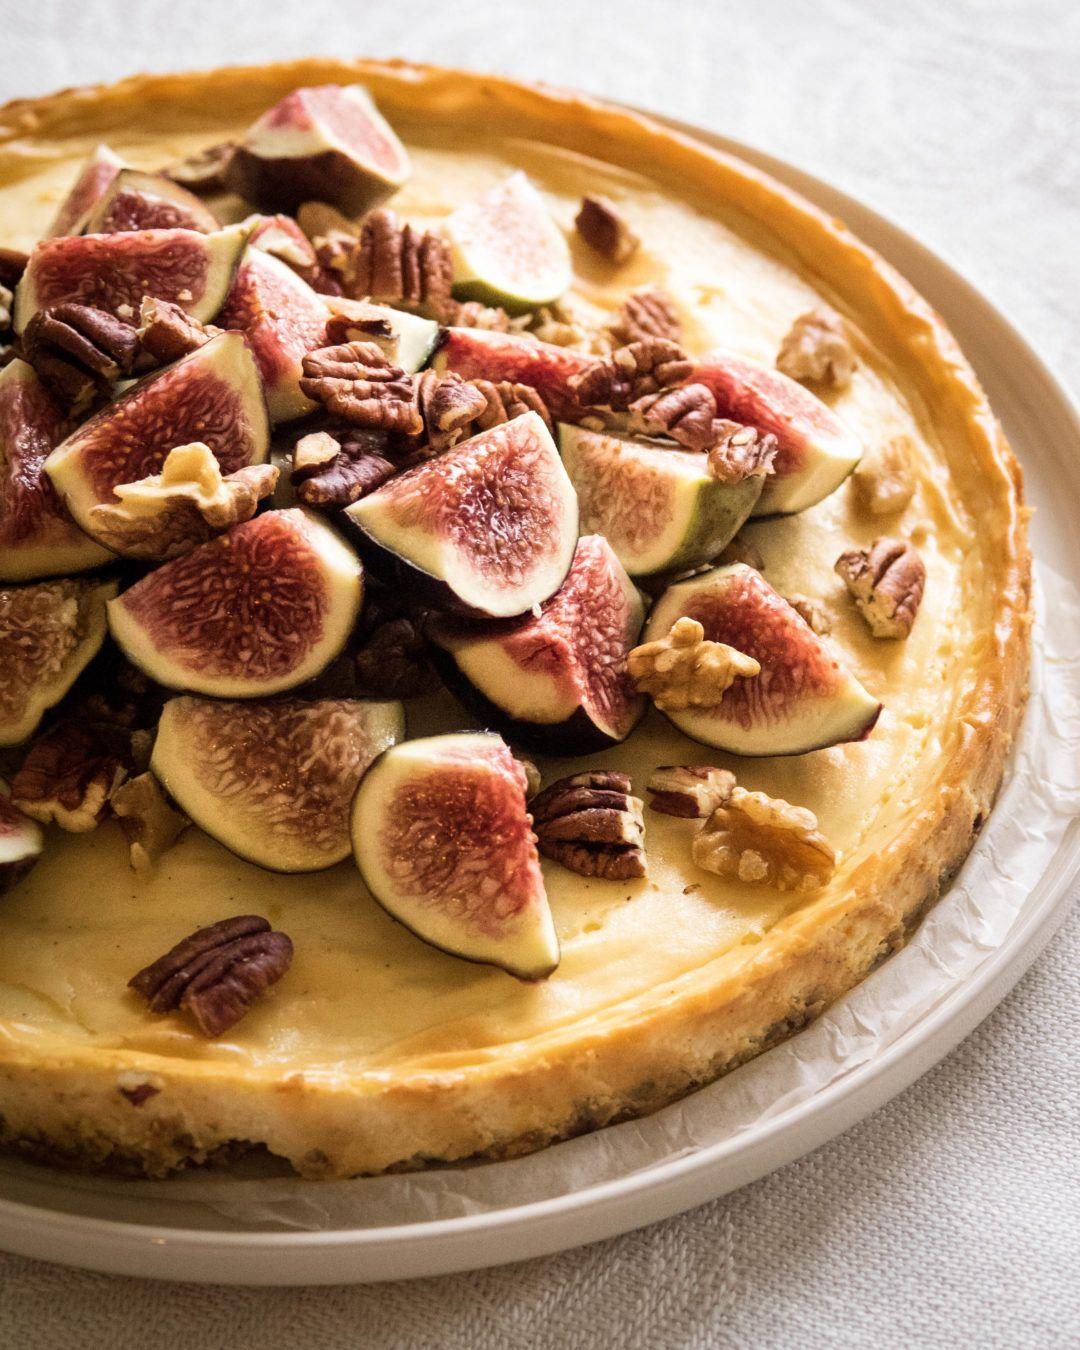 Paistettu viikunajuustokakku, fig cheesecake